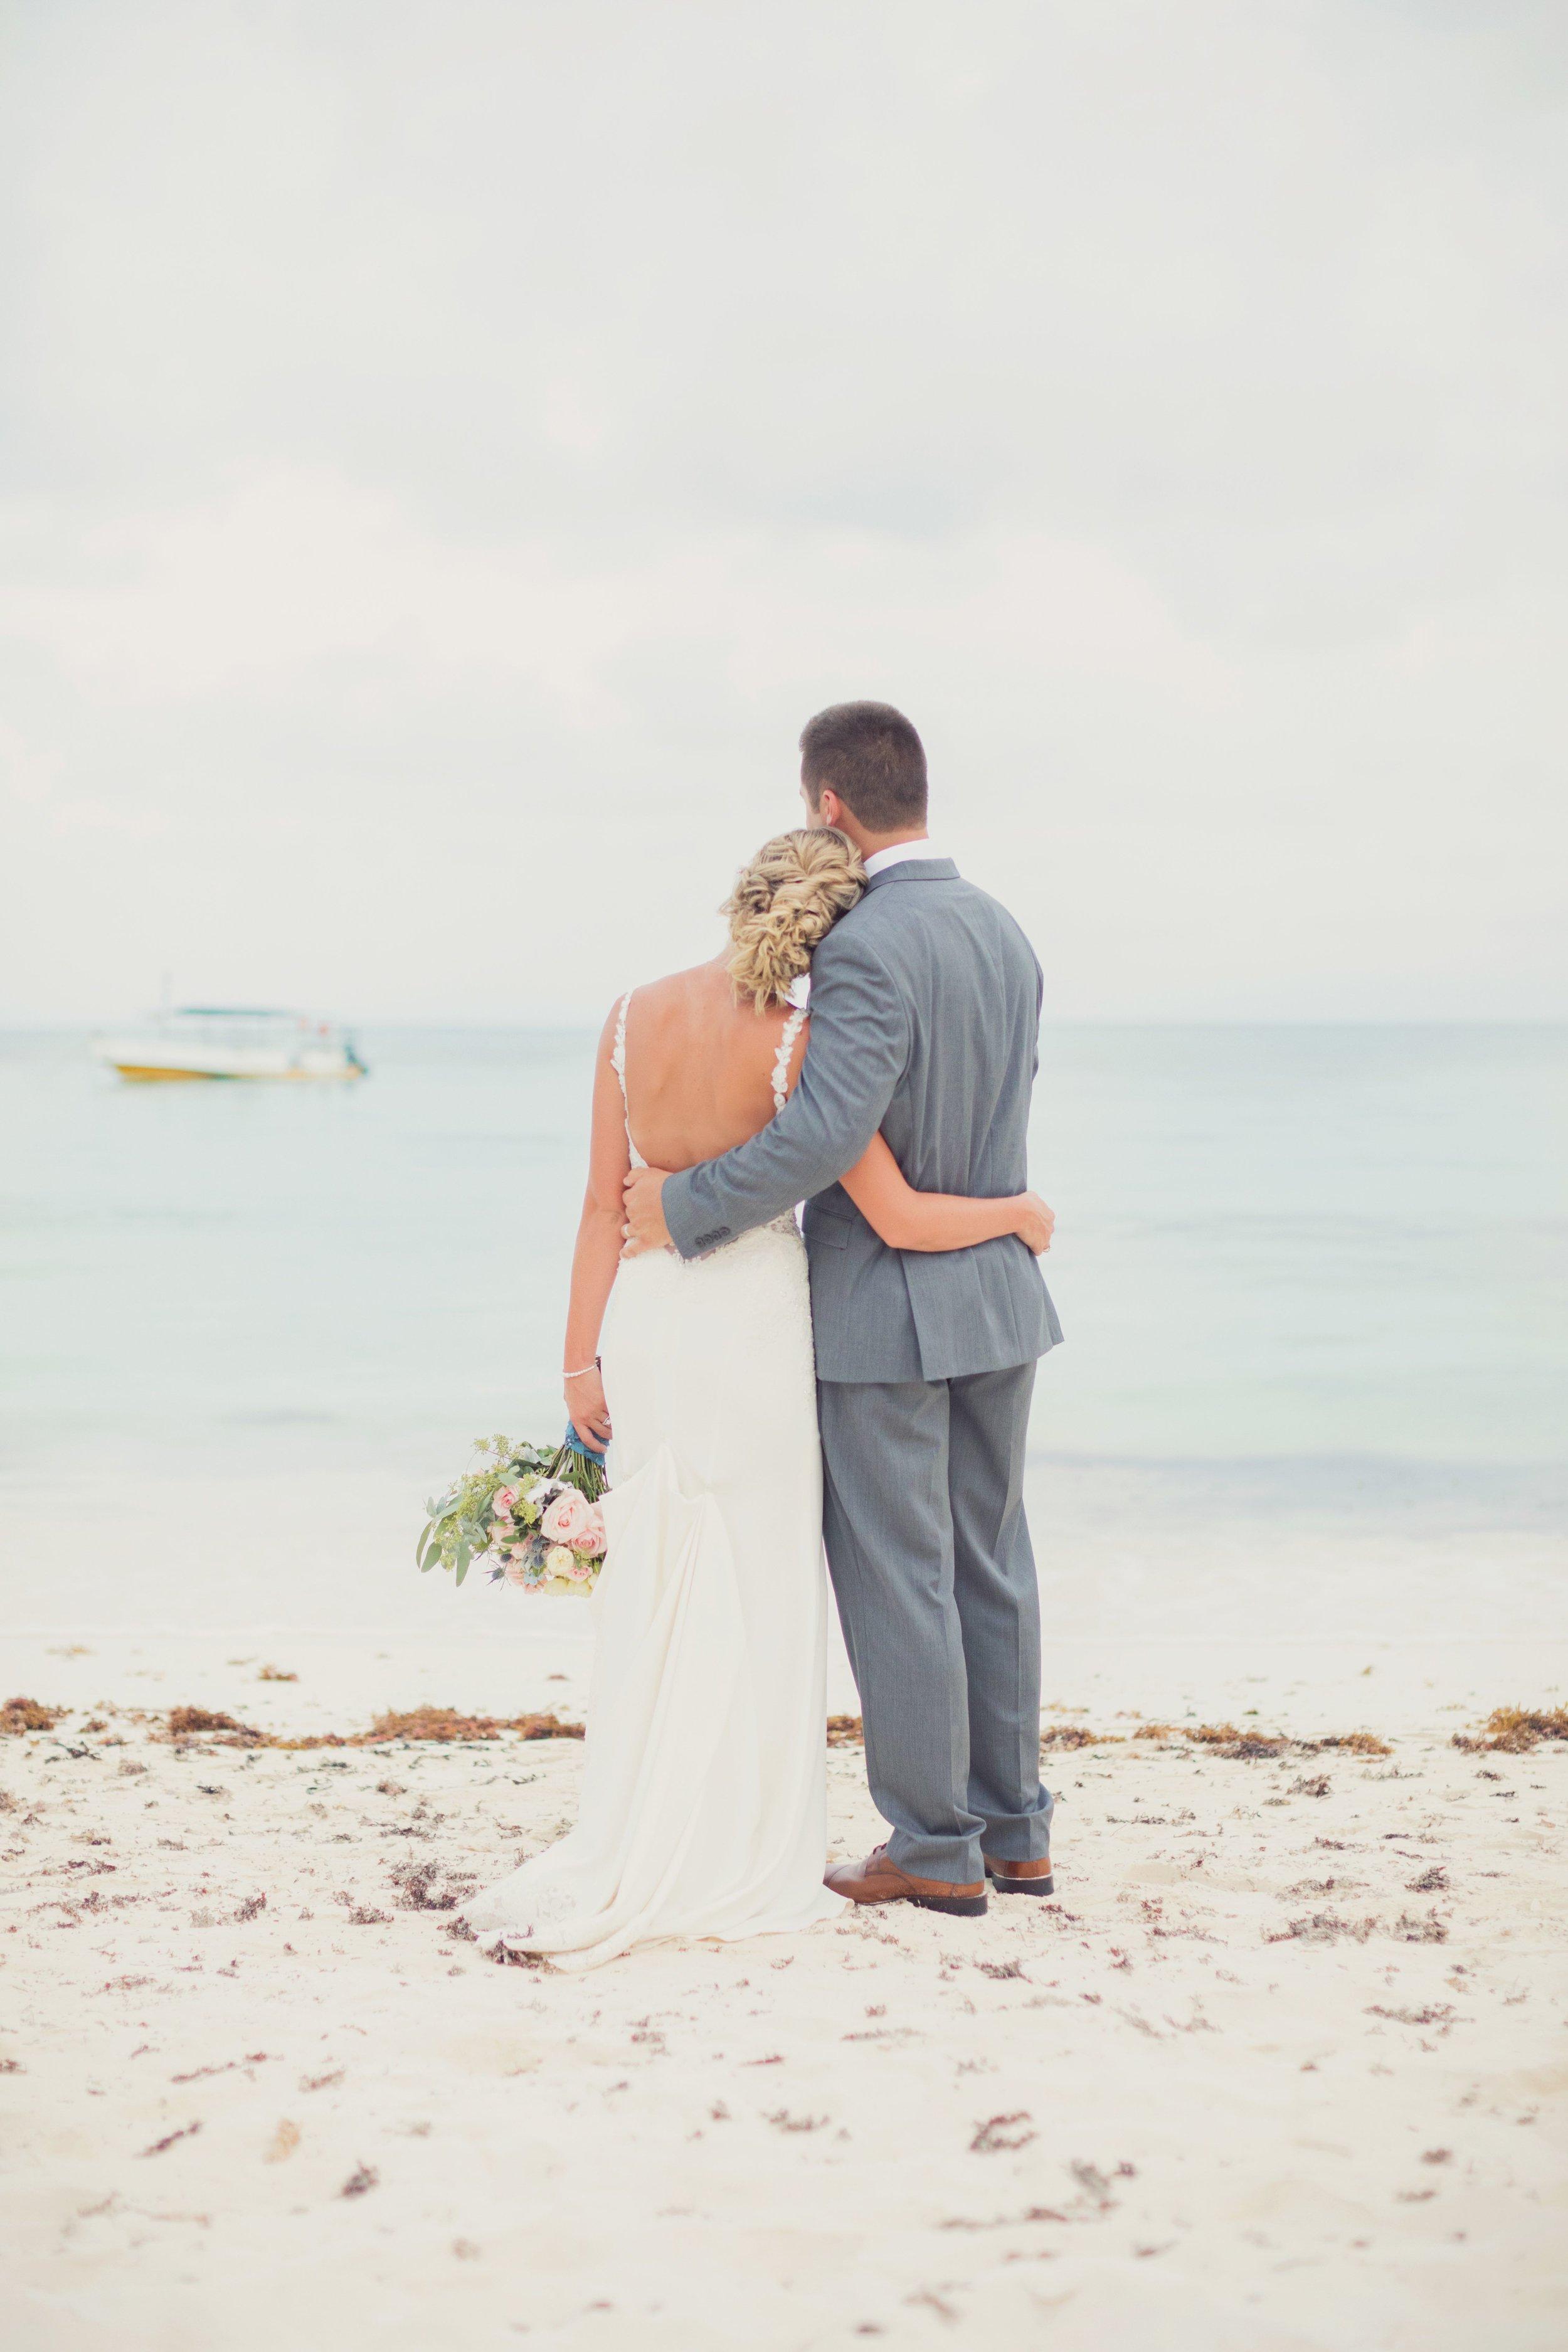 cancun-wedding-venue-villa-la-joya-958 copy-websize.jpg